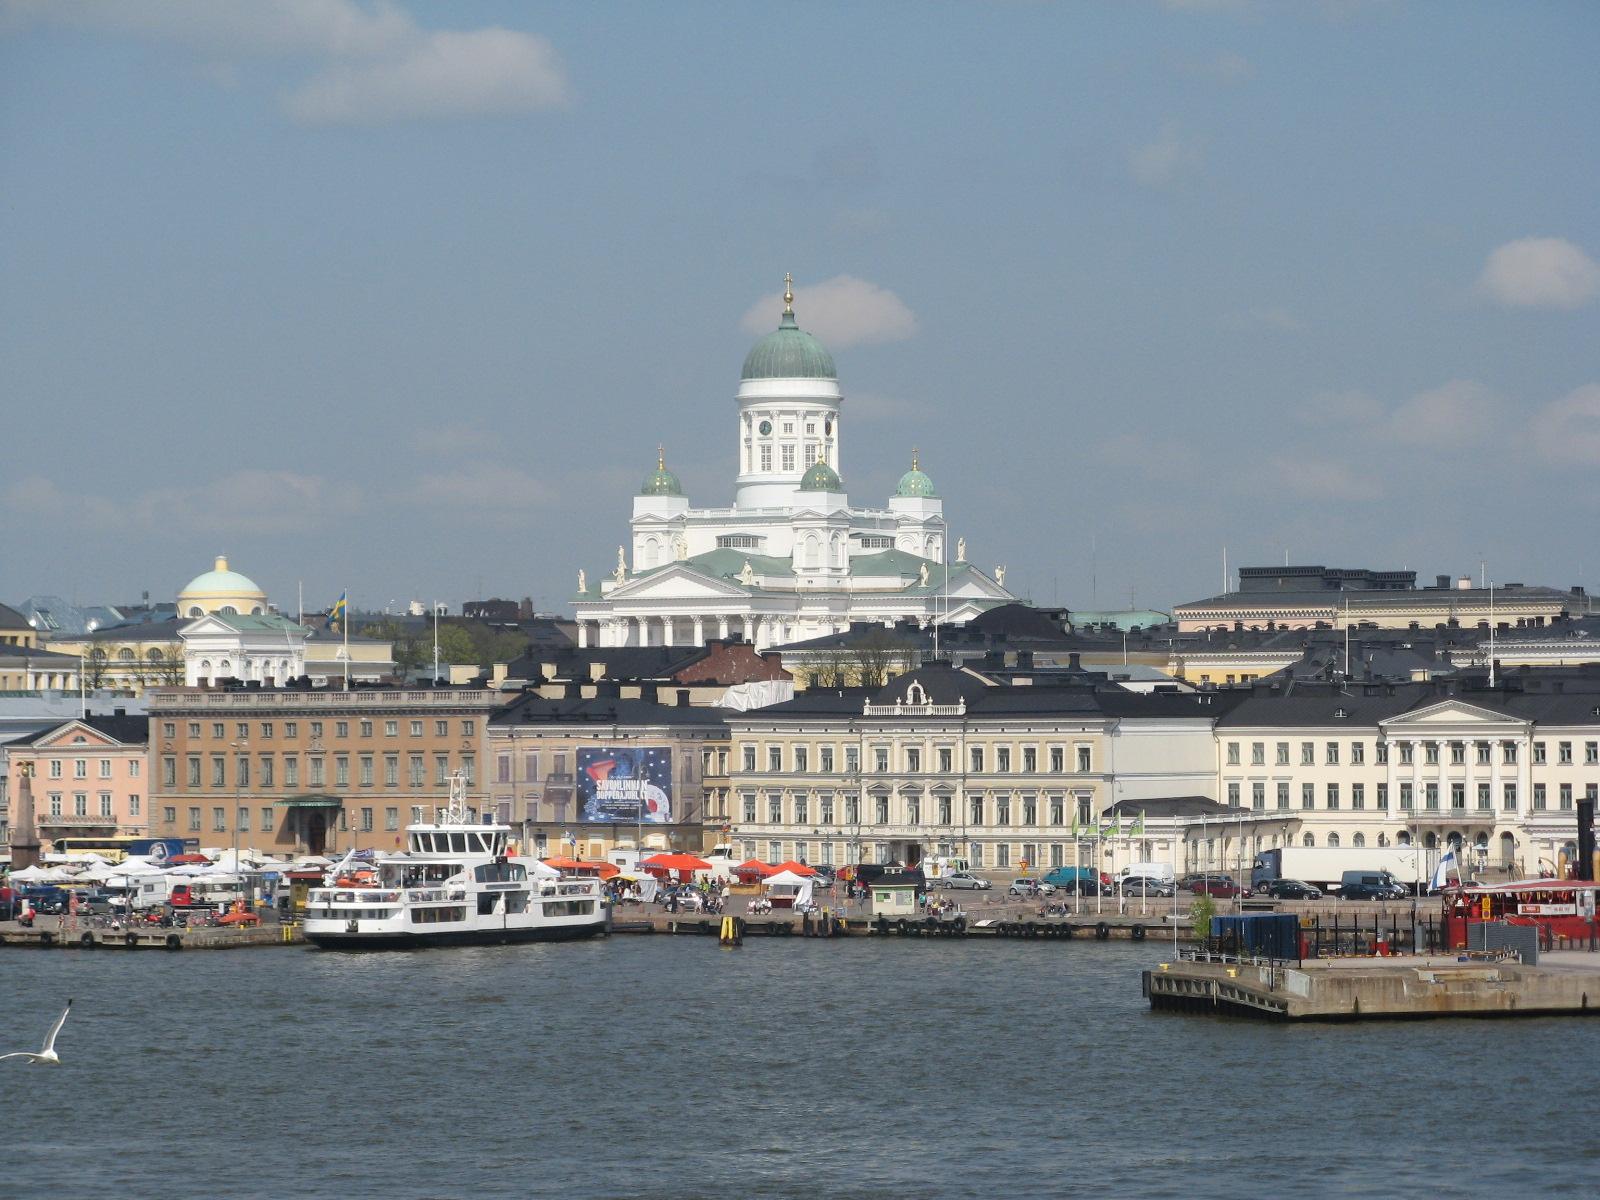 Helsinki-by-the-sea-FlickrCC-HannuMakarainen